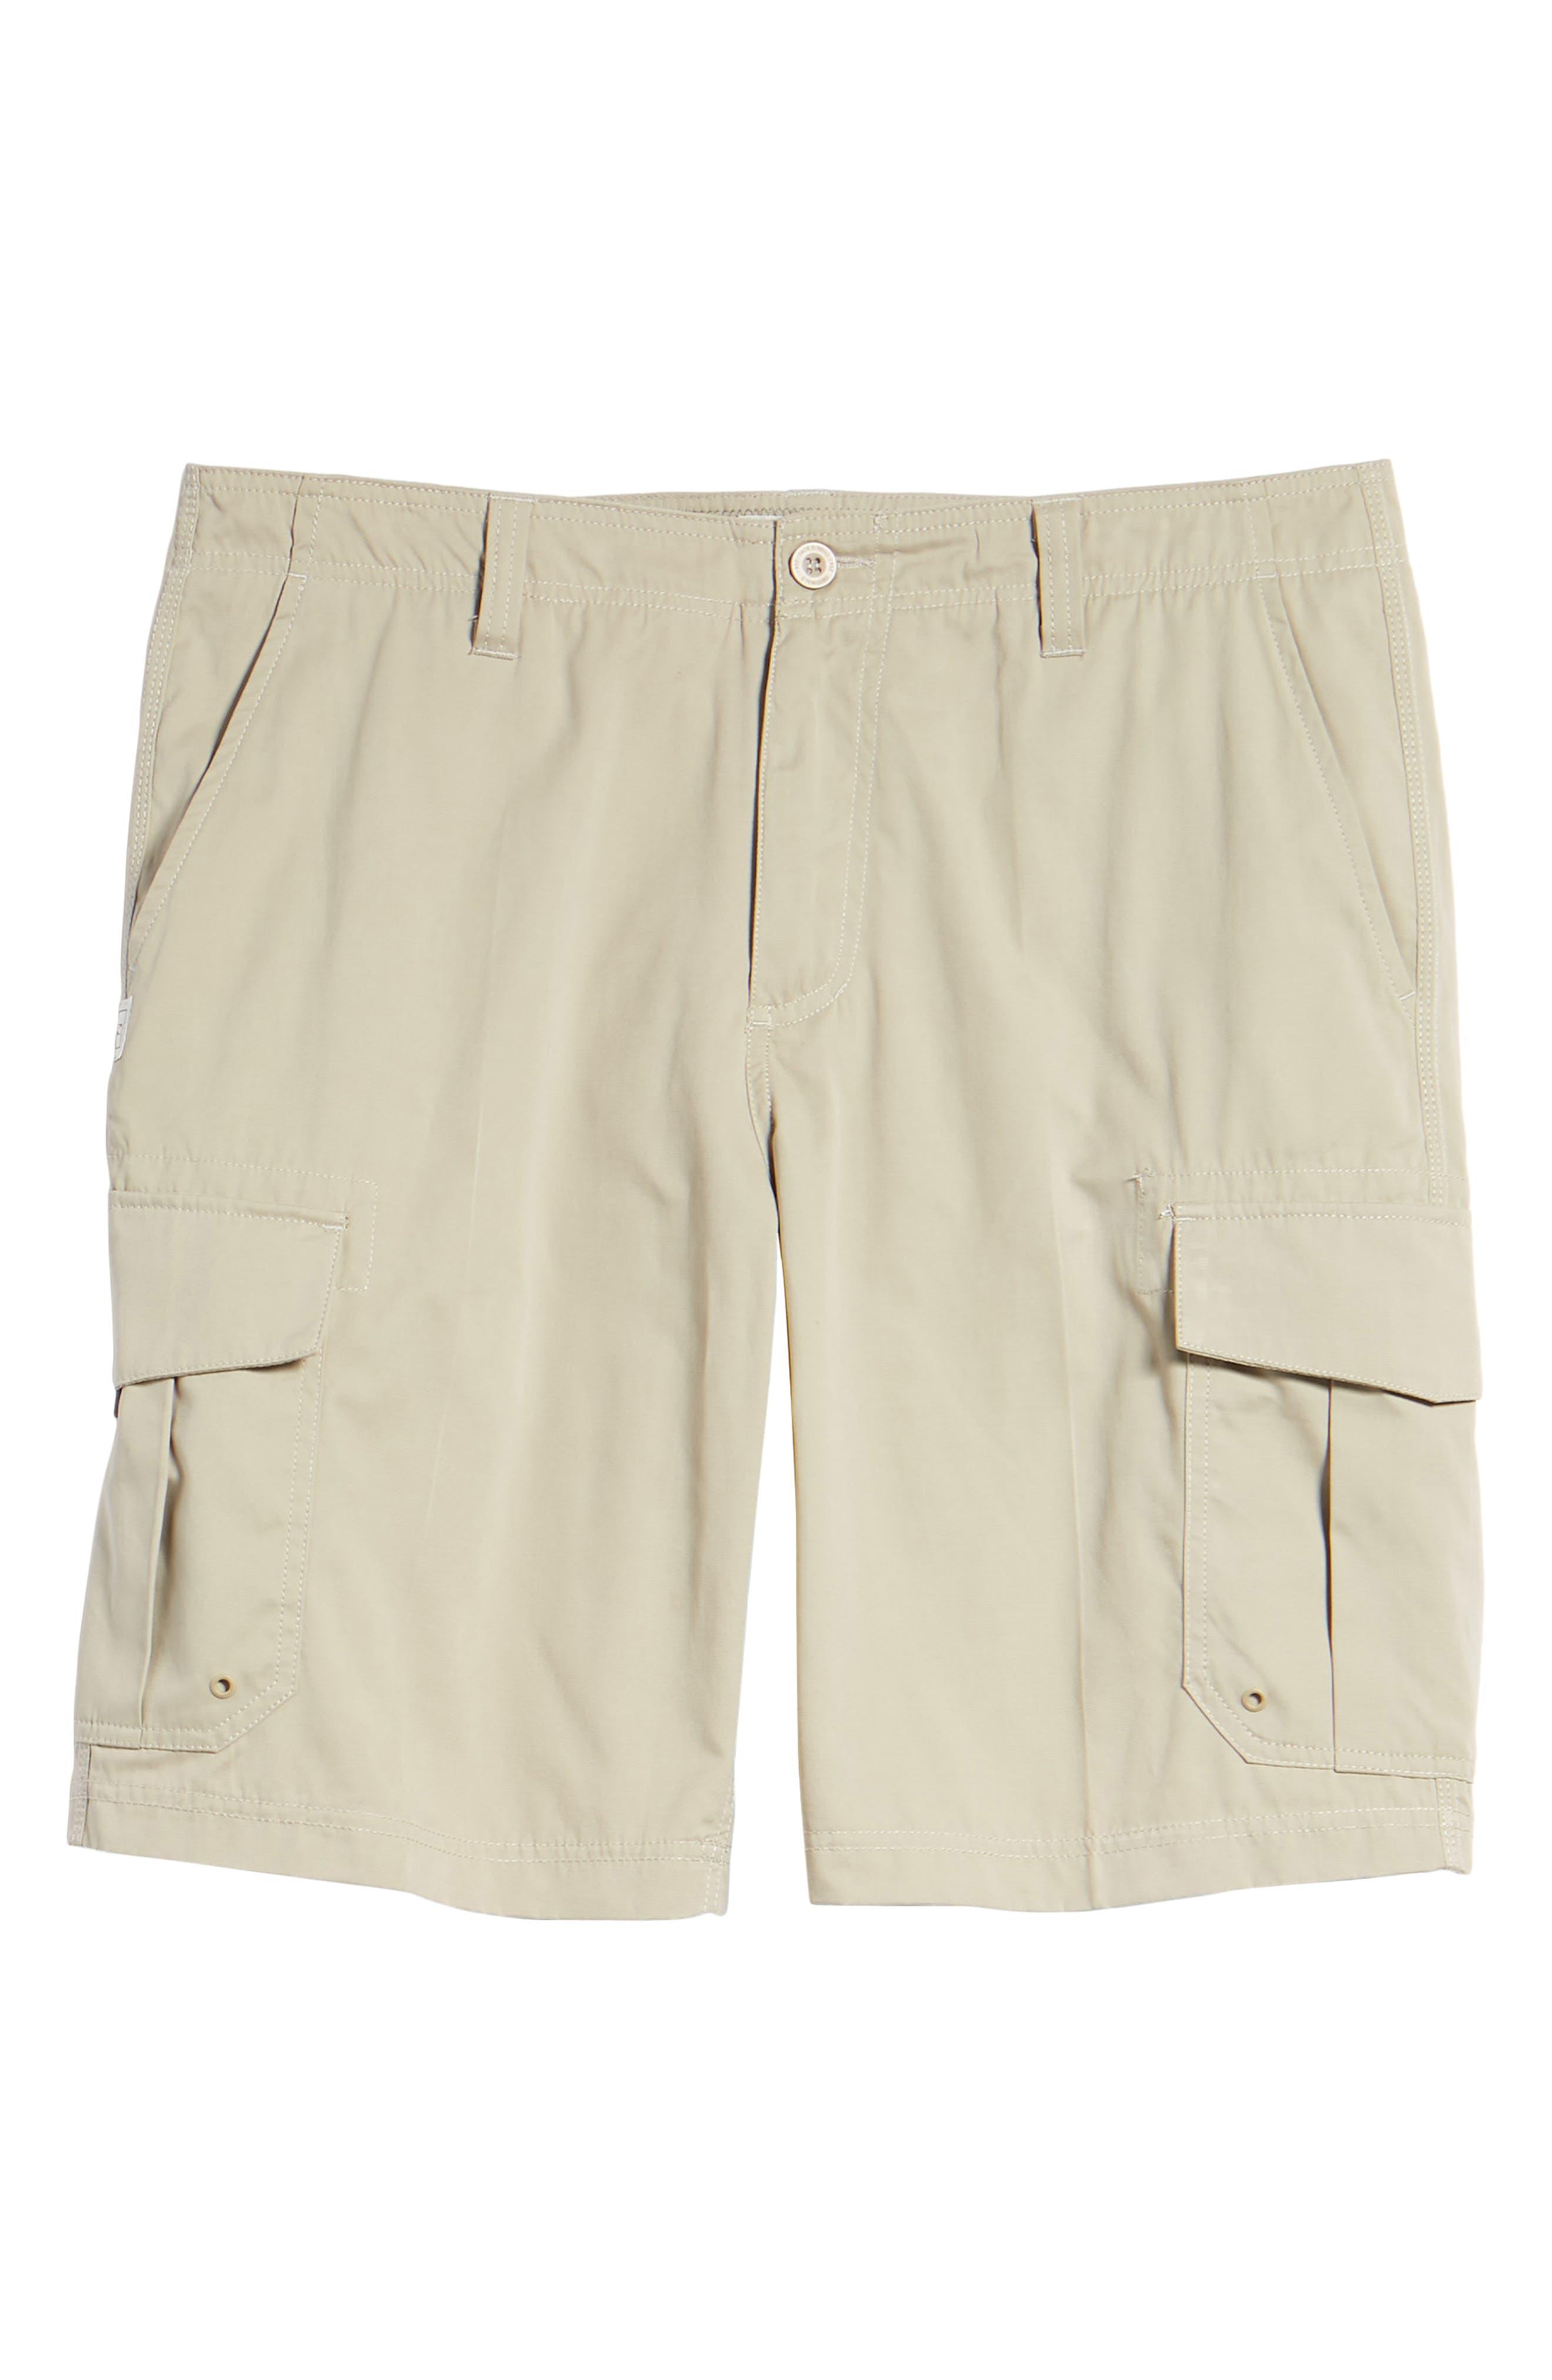 Landmark Cargo Shorts,                             Alternate thumbnail 6, color,